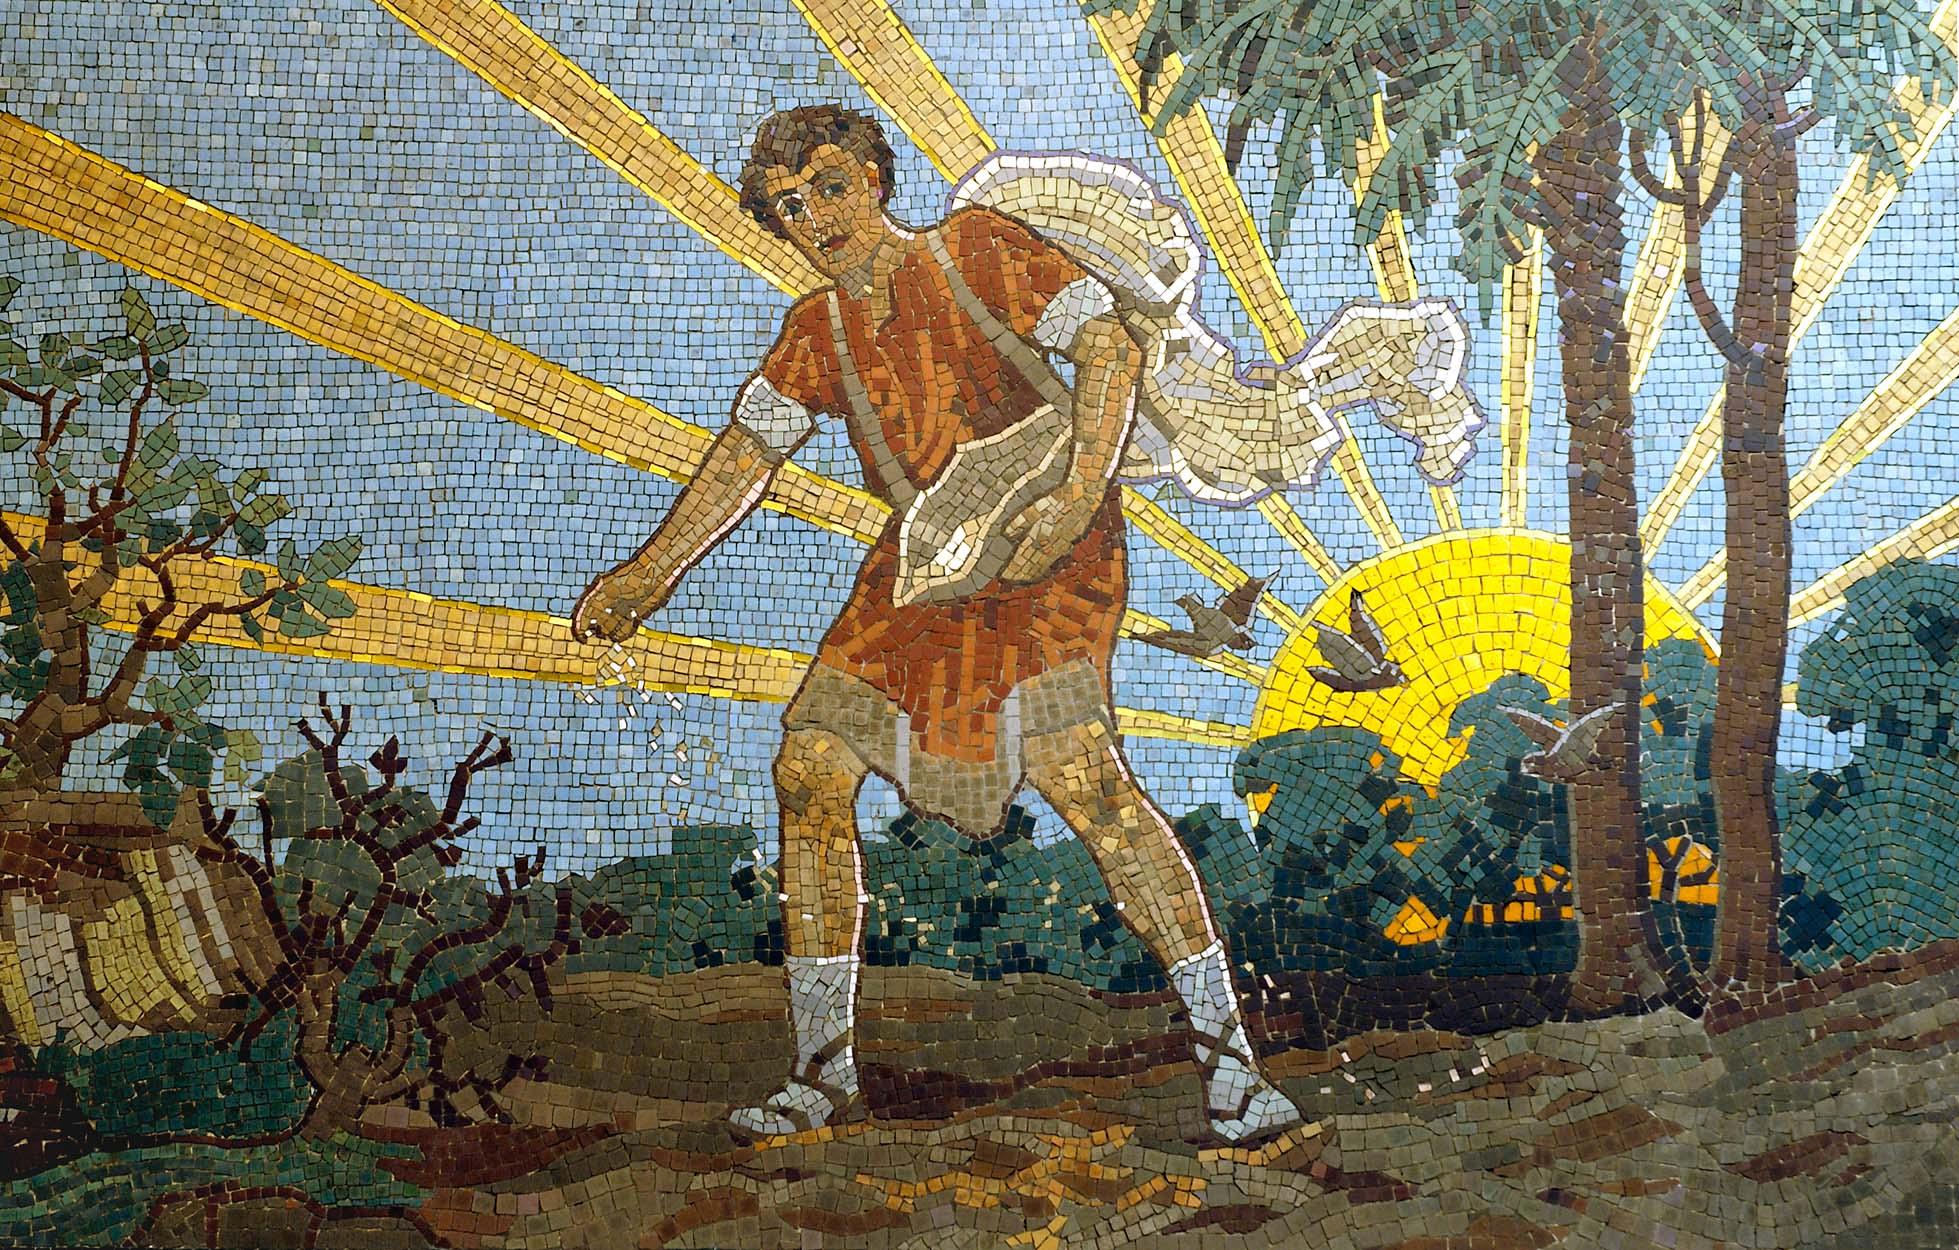 Sower mosaic ©John Crook